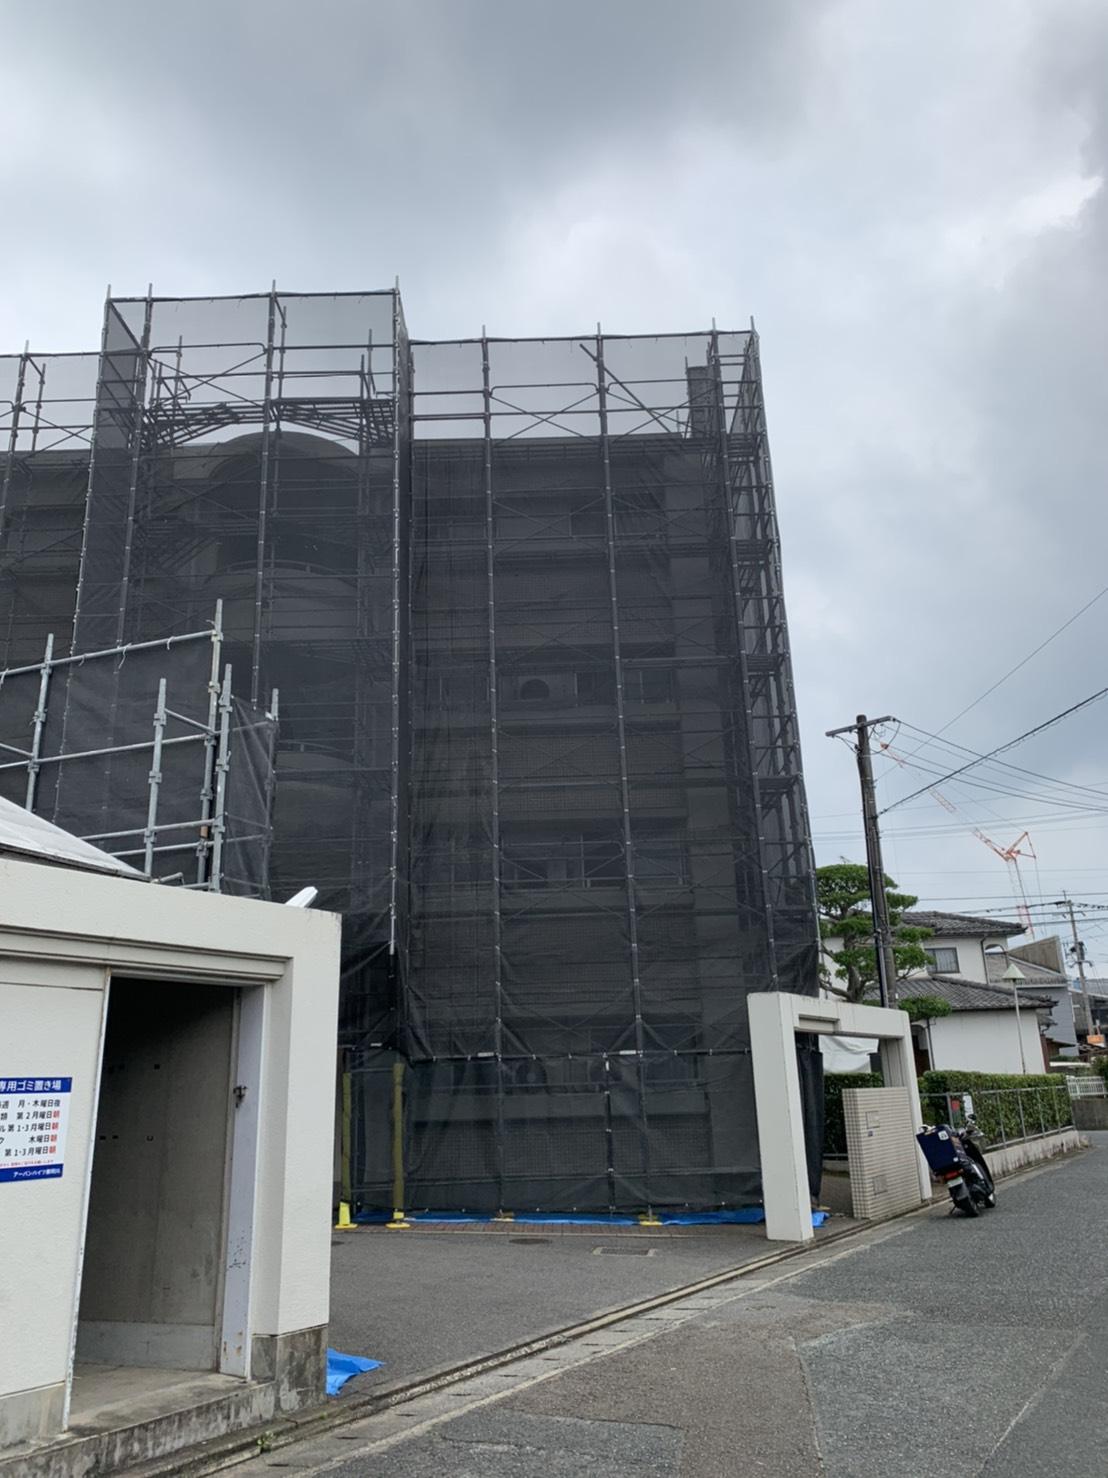 福岡県那珂川市 マンション 大規模改修工事 足場②